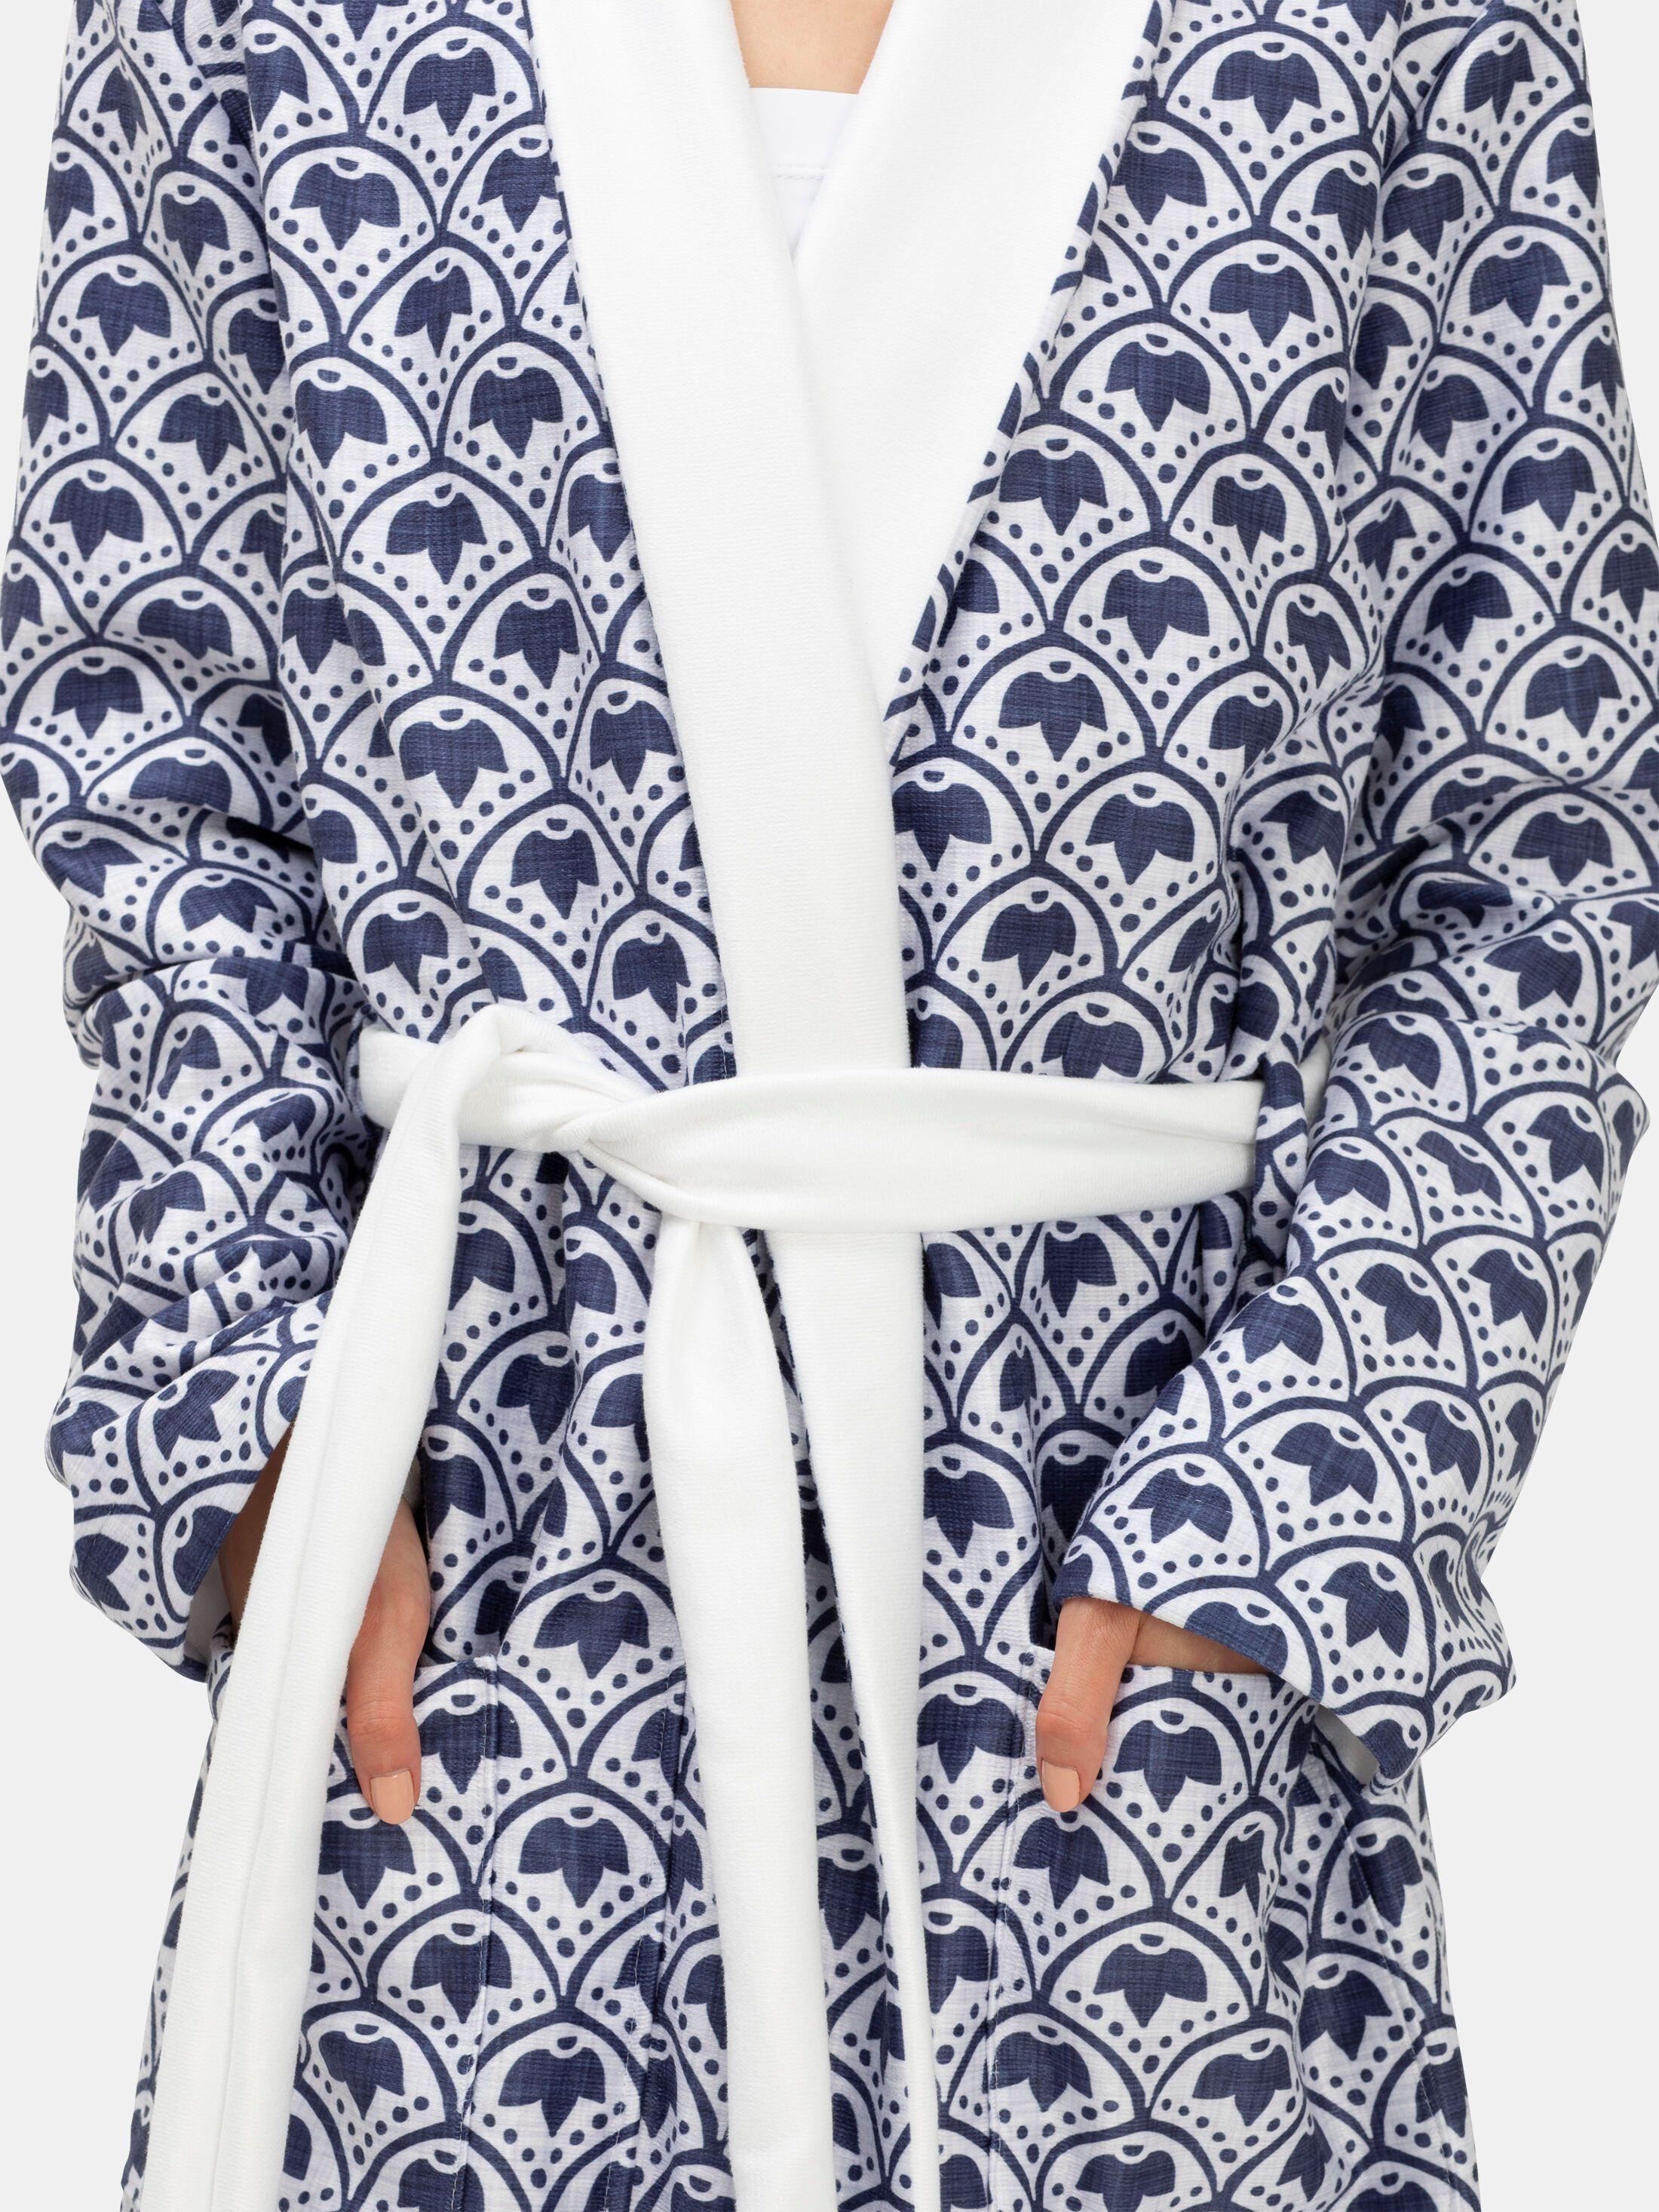 custom dressing gown